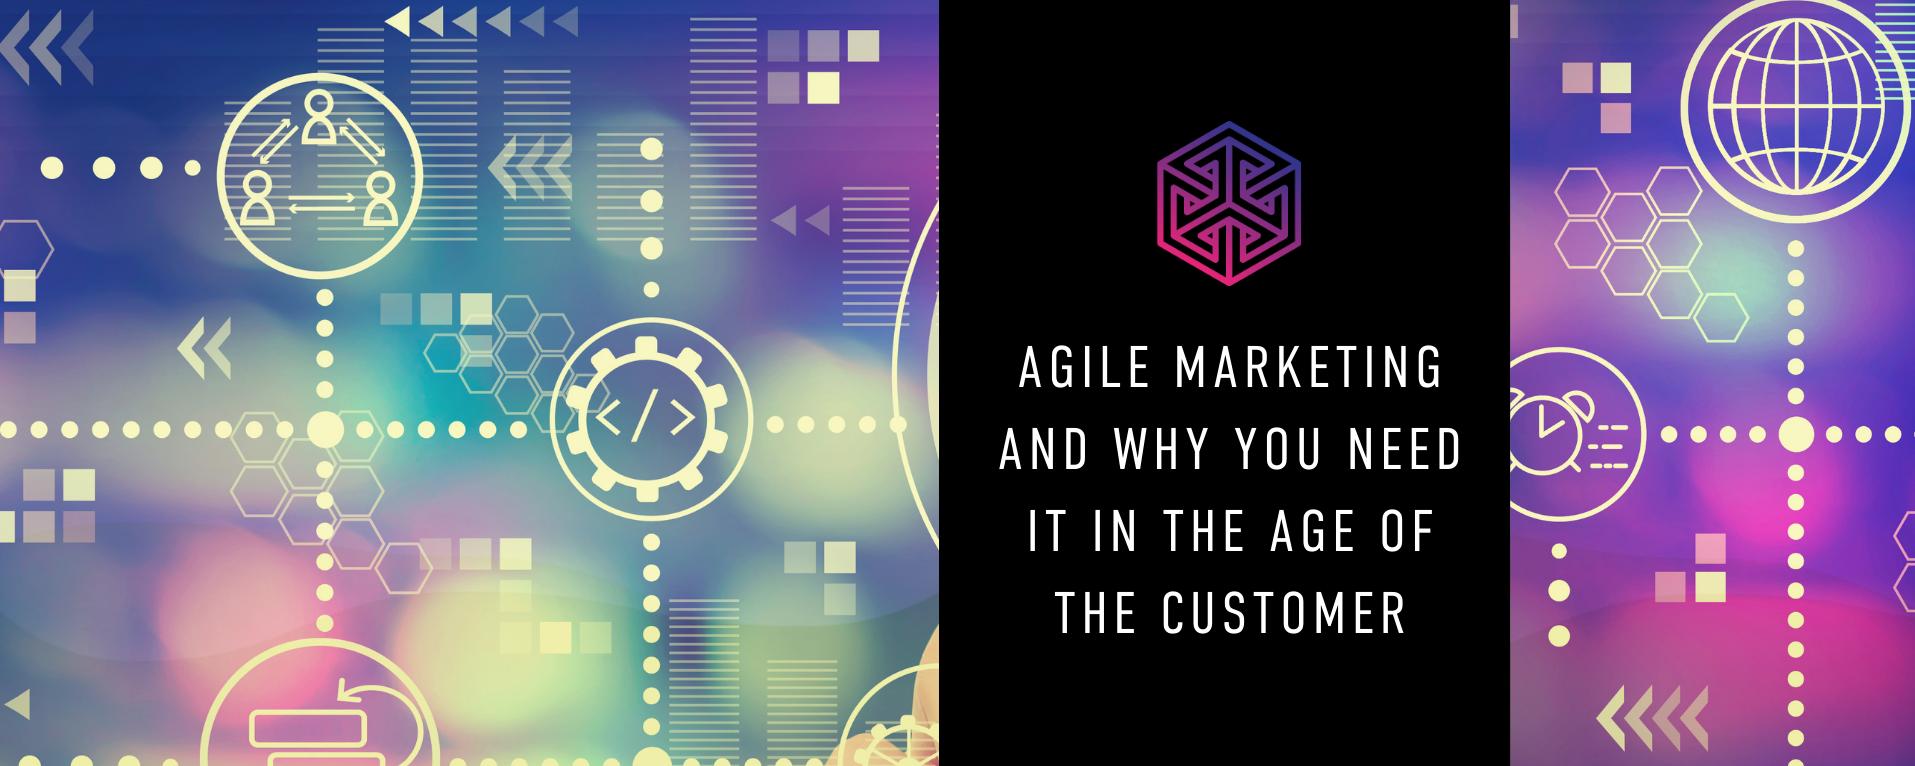 Tribe of Brands Blog. Digital marketing and web design agency.